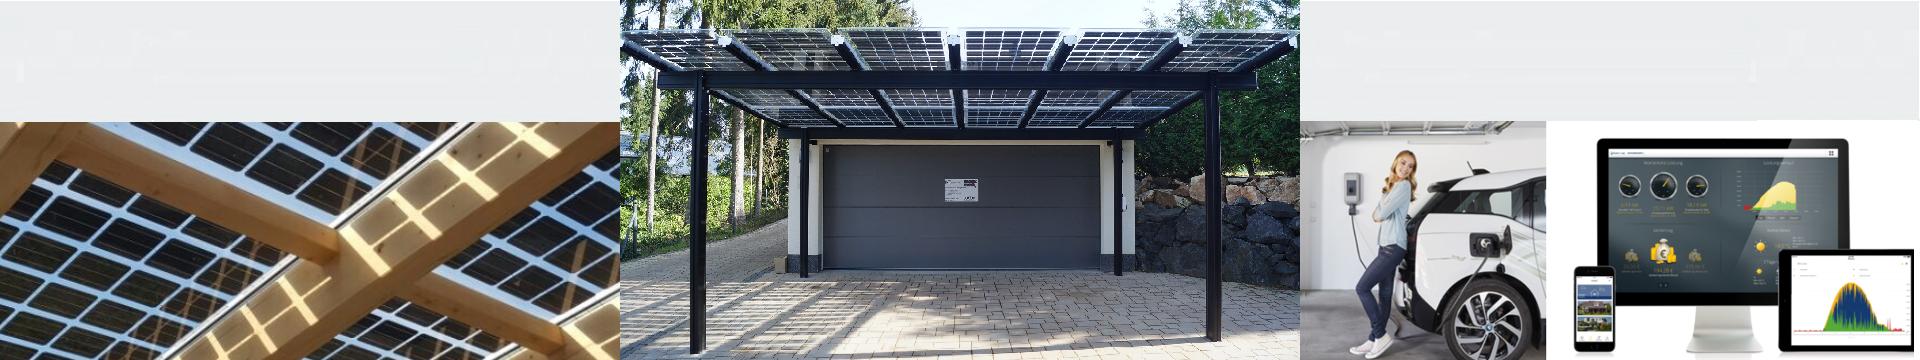 PowerSystem für Stahlcarport mit KEBA-Ladstation und Solar-Log